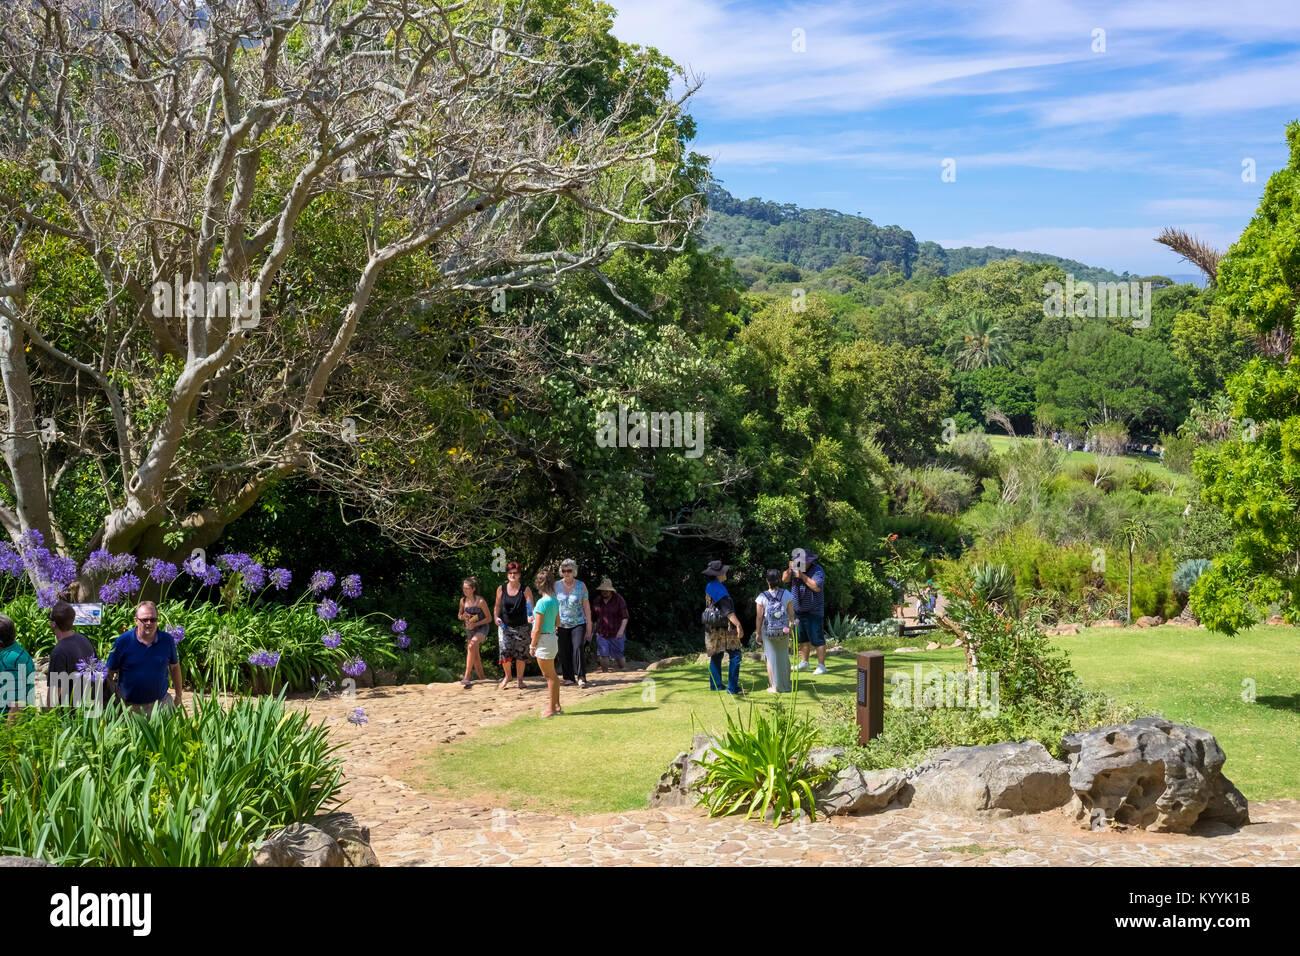 Kirstenbosch National Botanical Gardens, Newlands, Città del Capo, Sud Africa Immagini Stock